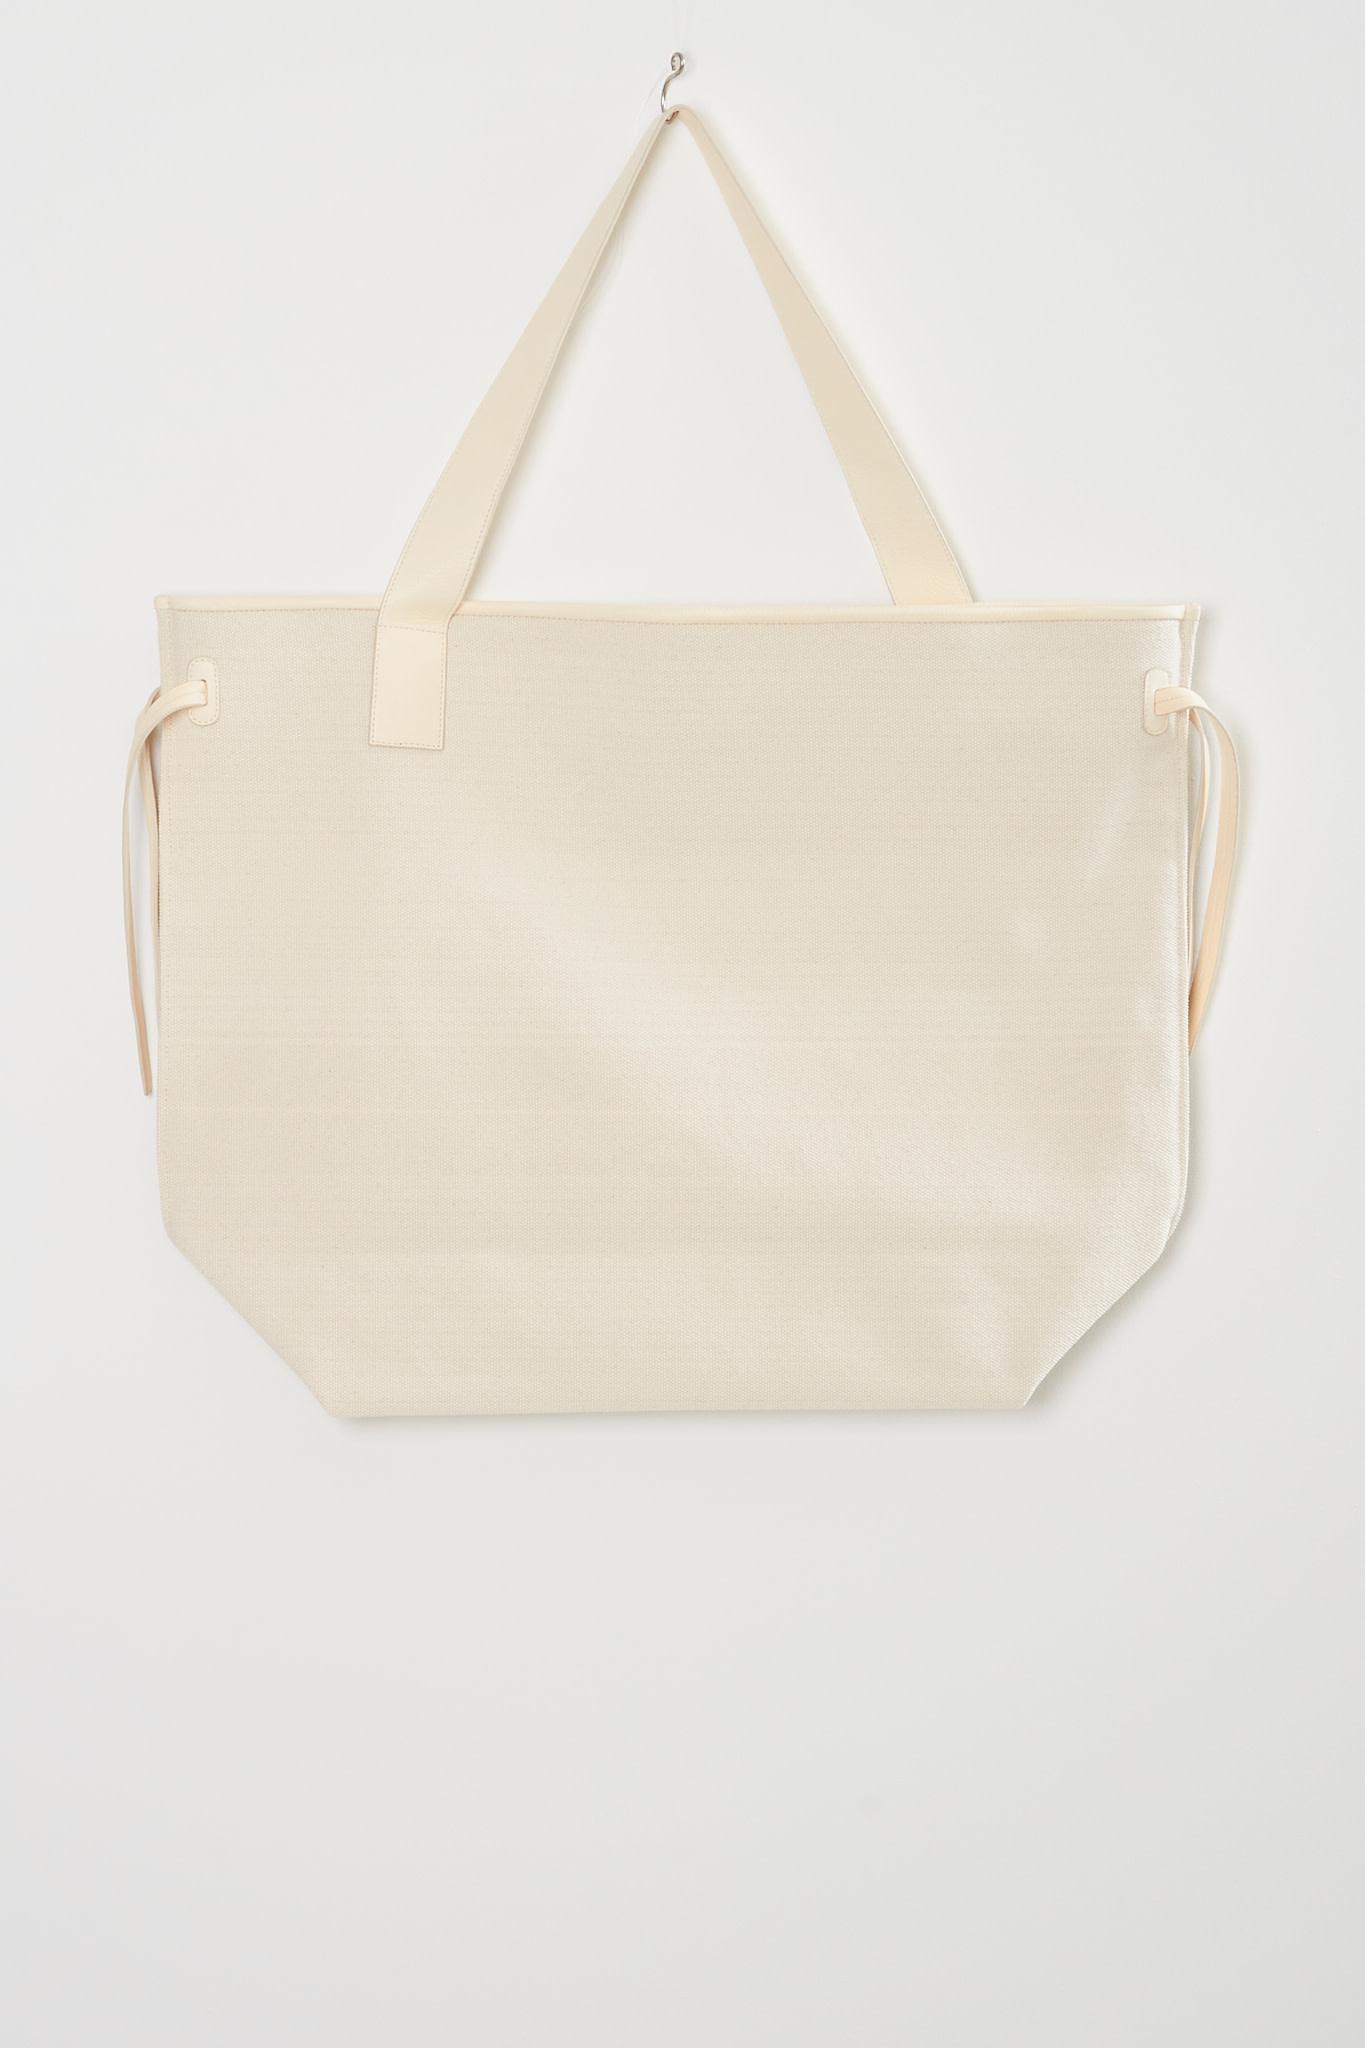 Aeron Philippine bag